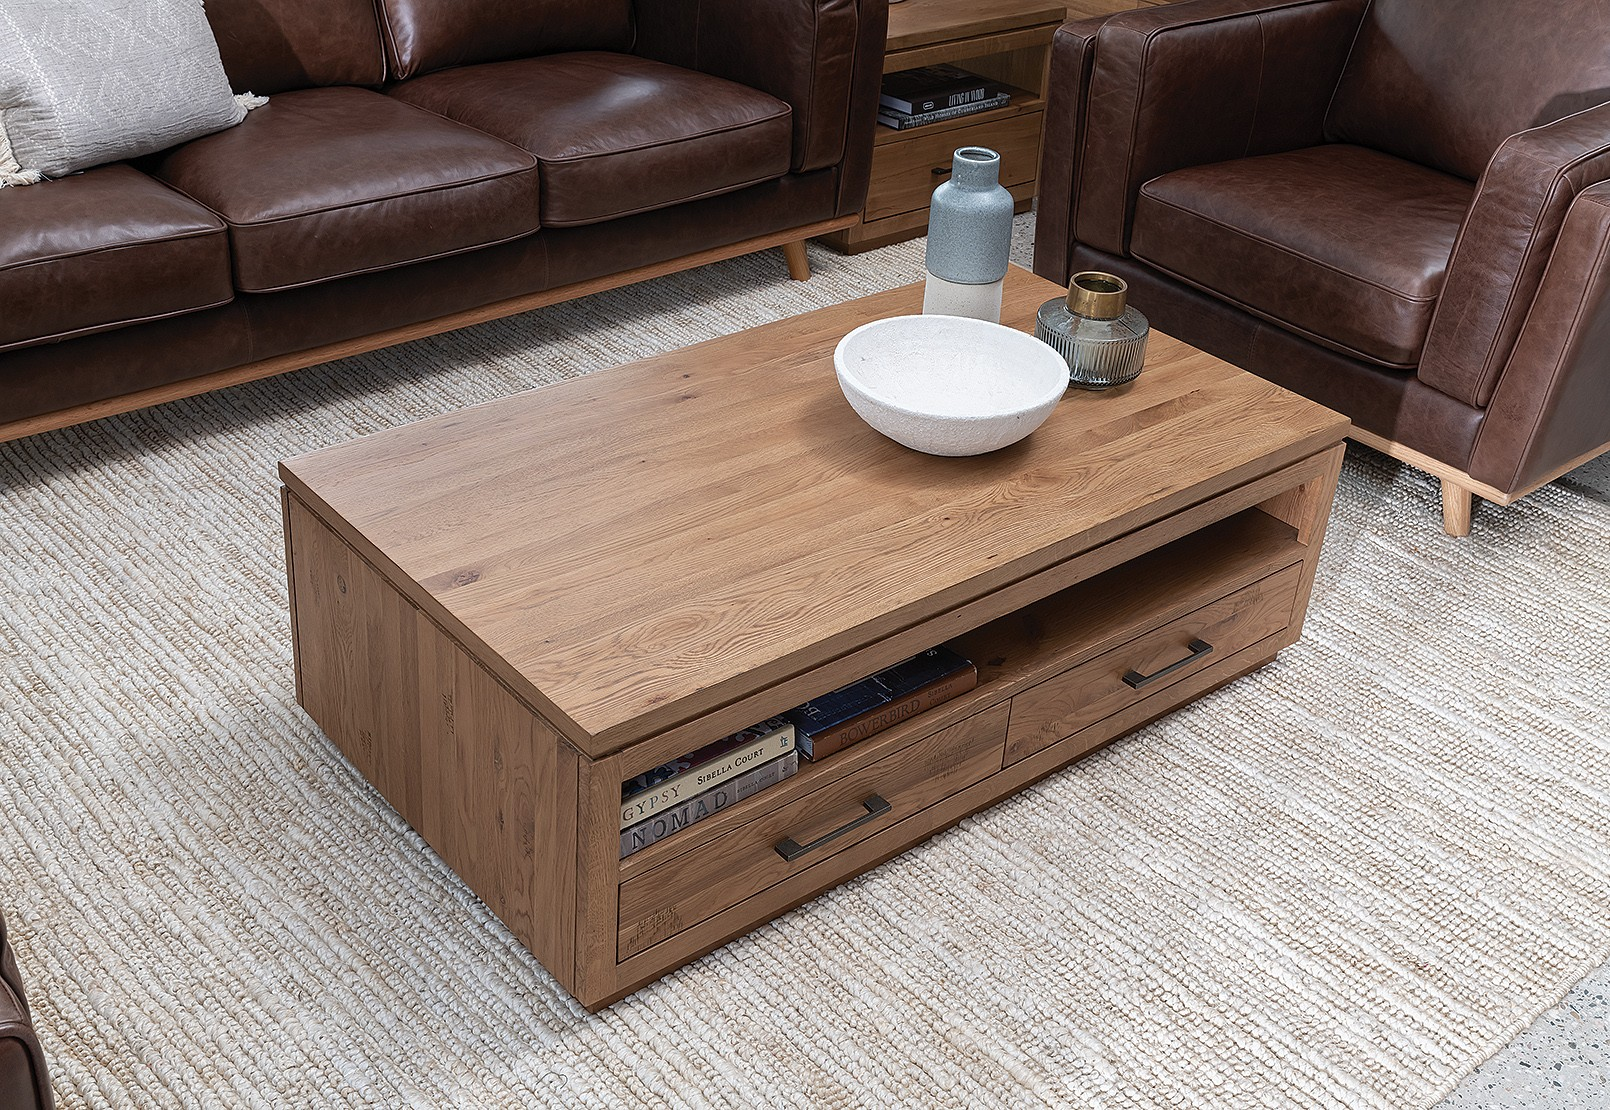 Grottepastenaecollepardo   Furnitures Heaven